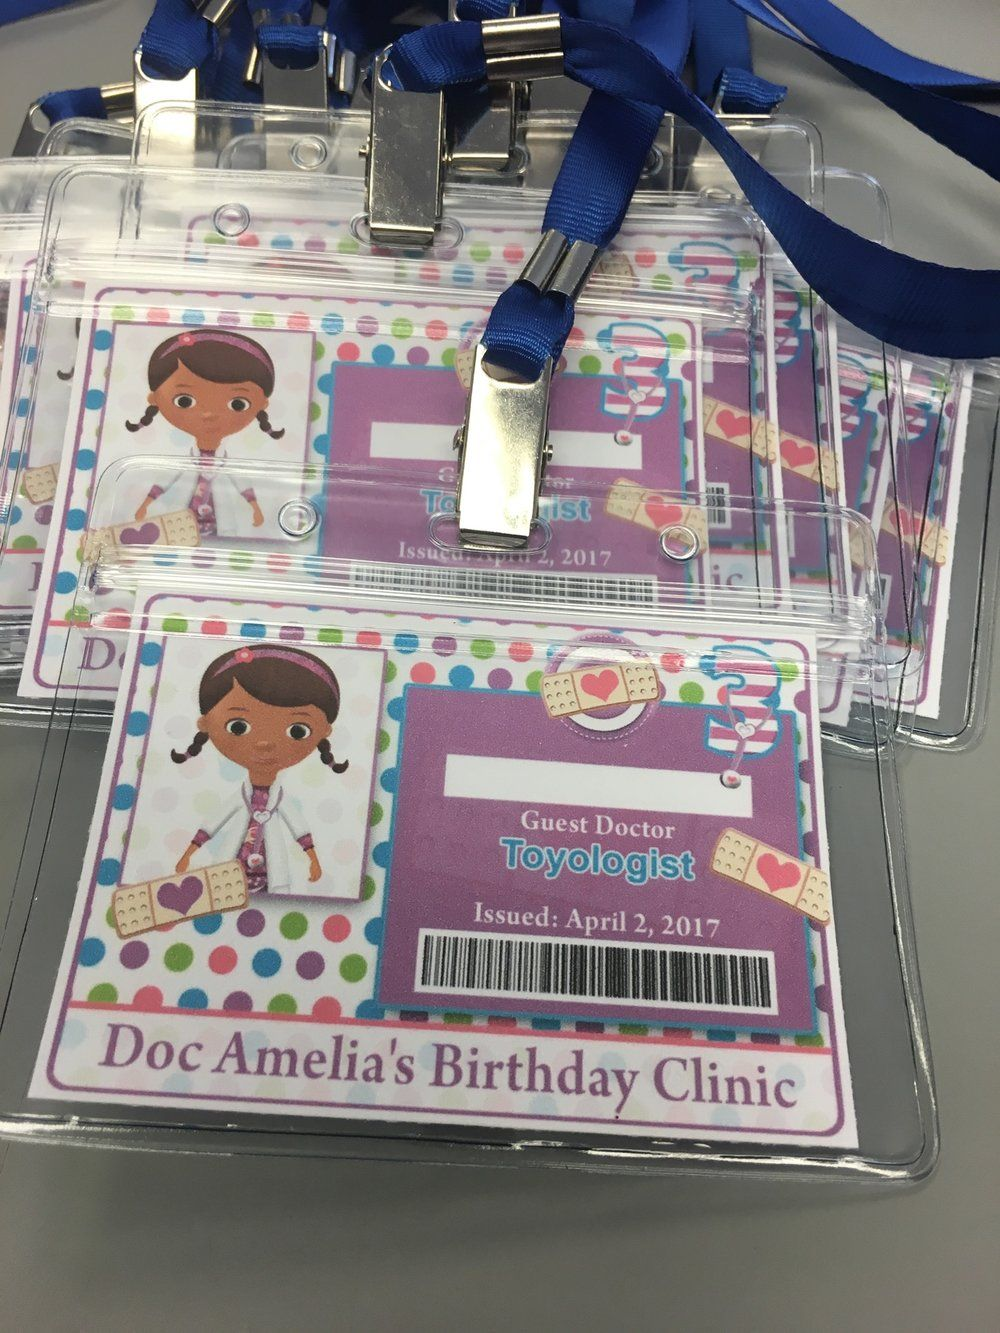 Doc mcstuffins bandages doc mcstuffins party ideas on pinterest doc - Doctor Badges For The Kids At The Doc Mcstuffins Birthday Party